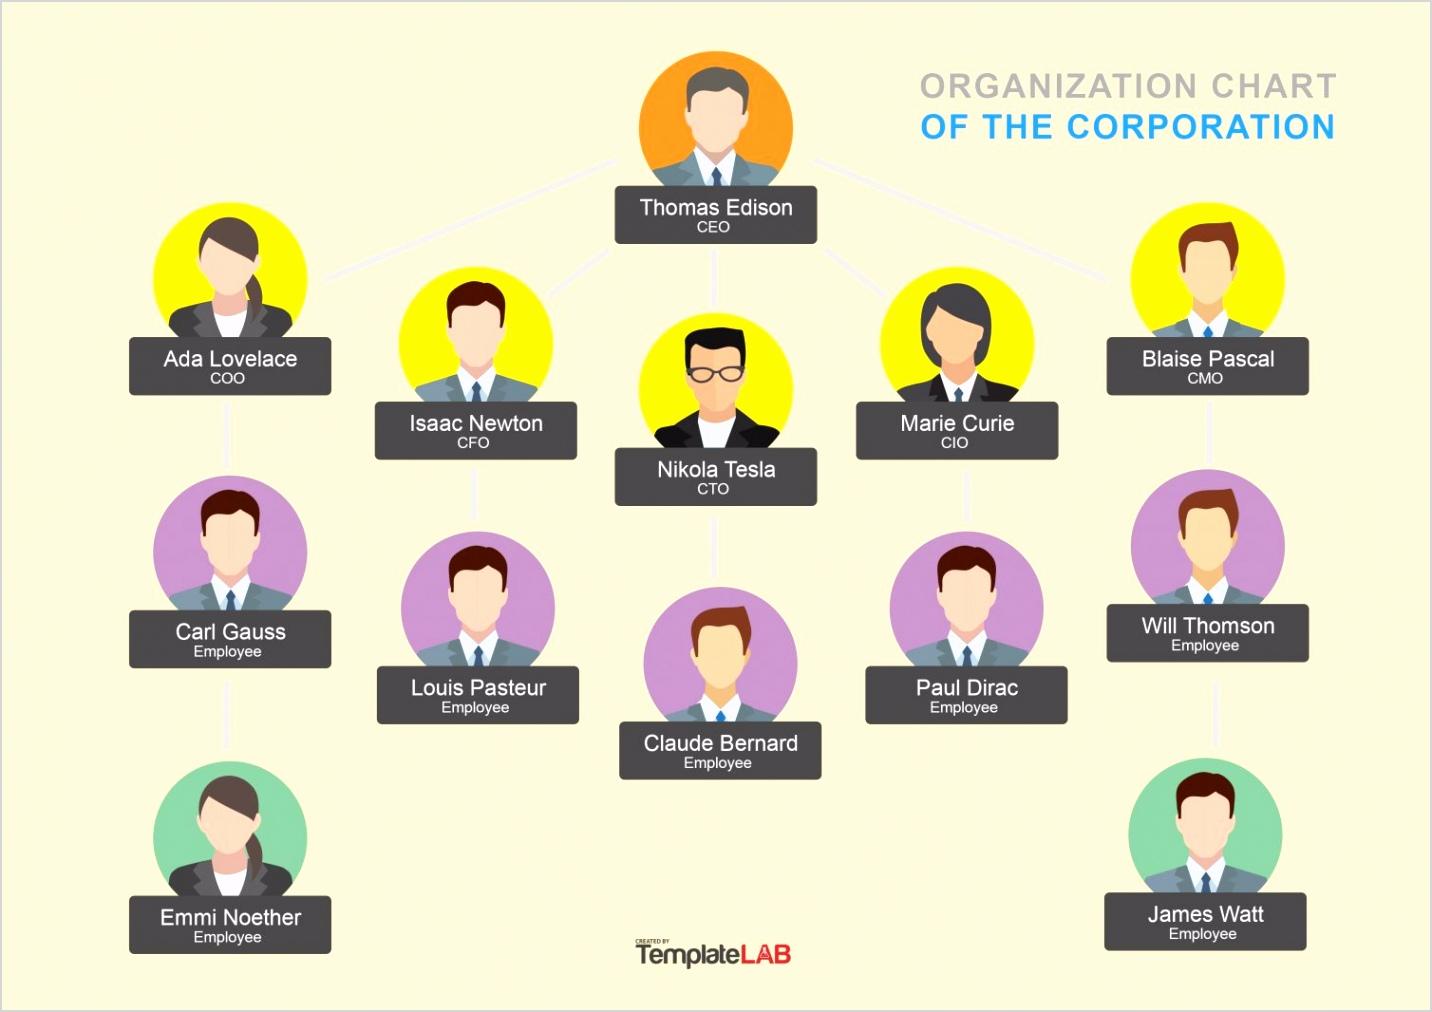 Organization Chart Template 7 TemplateLab e